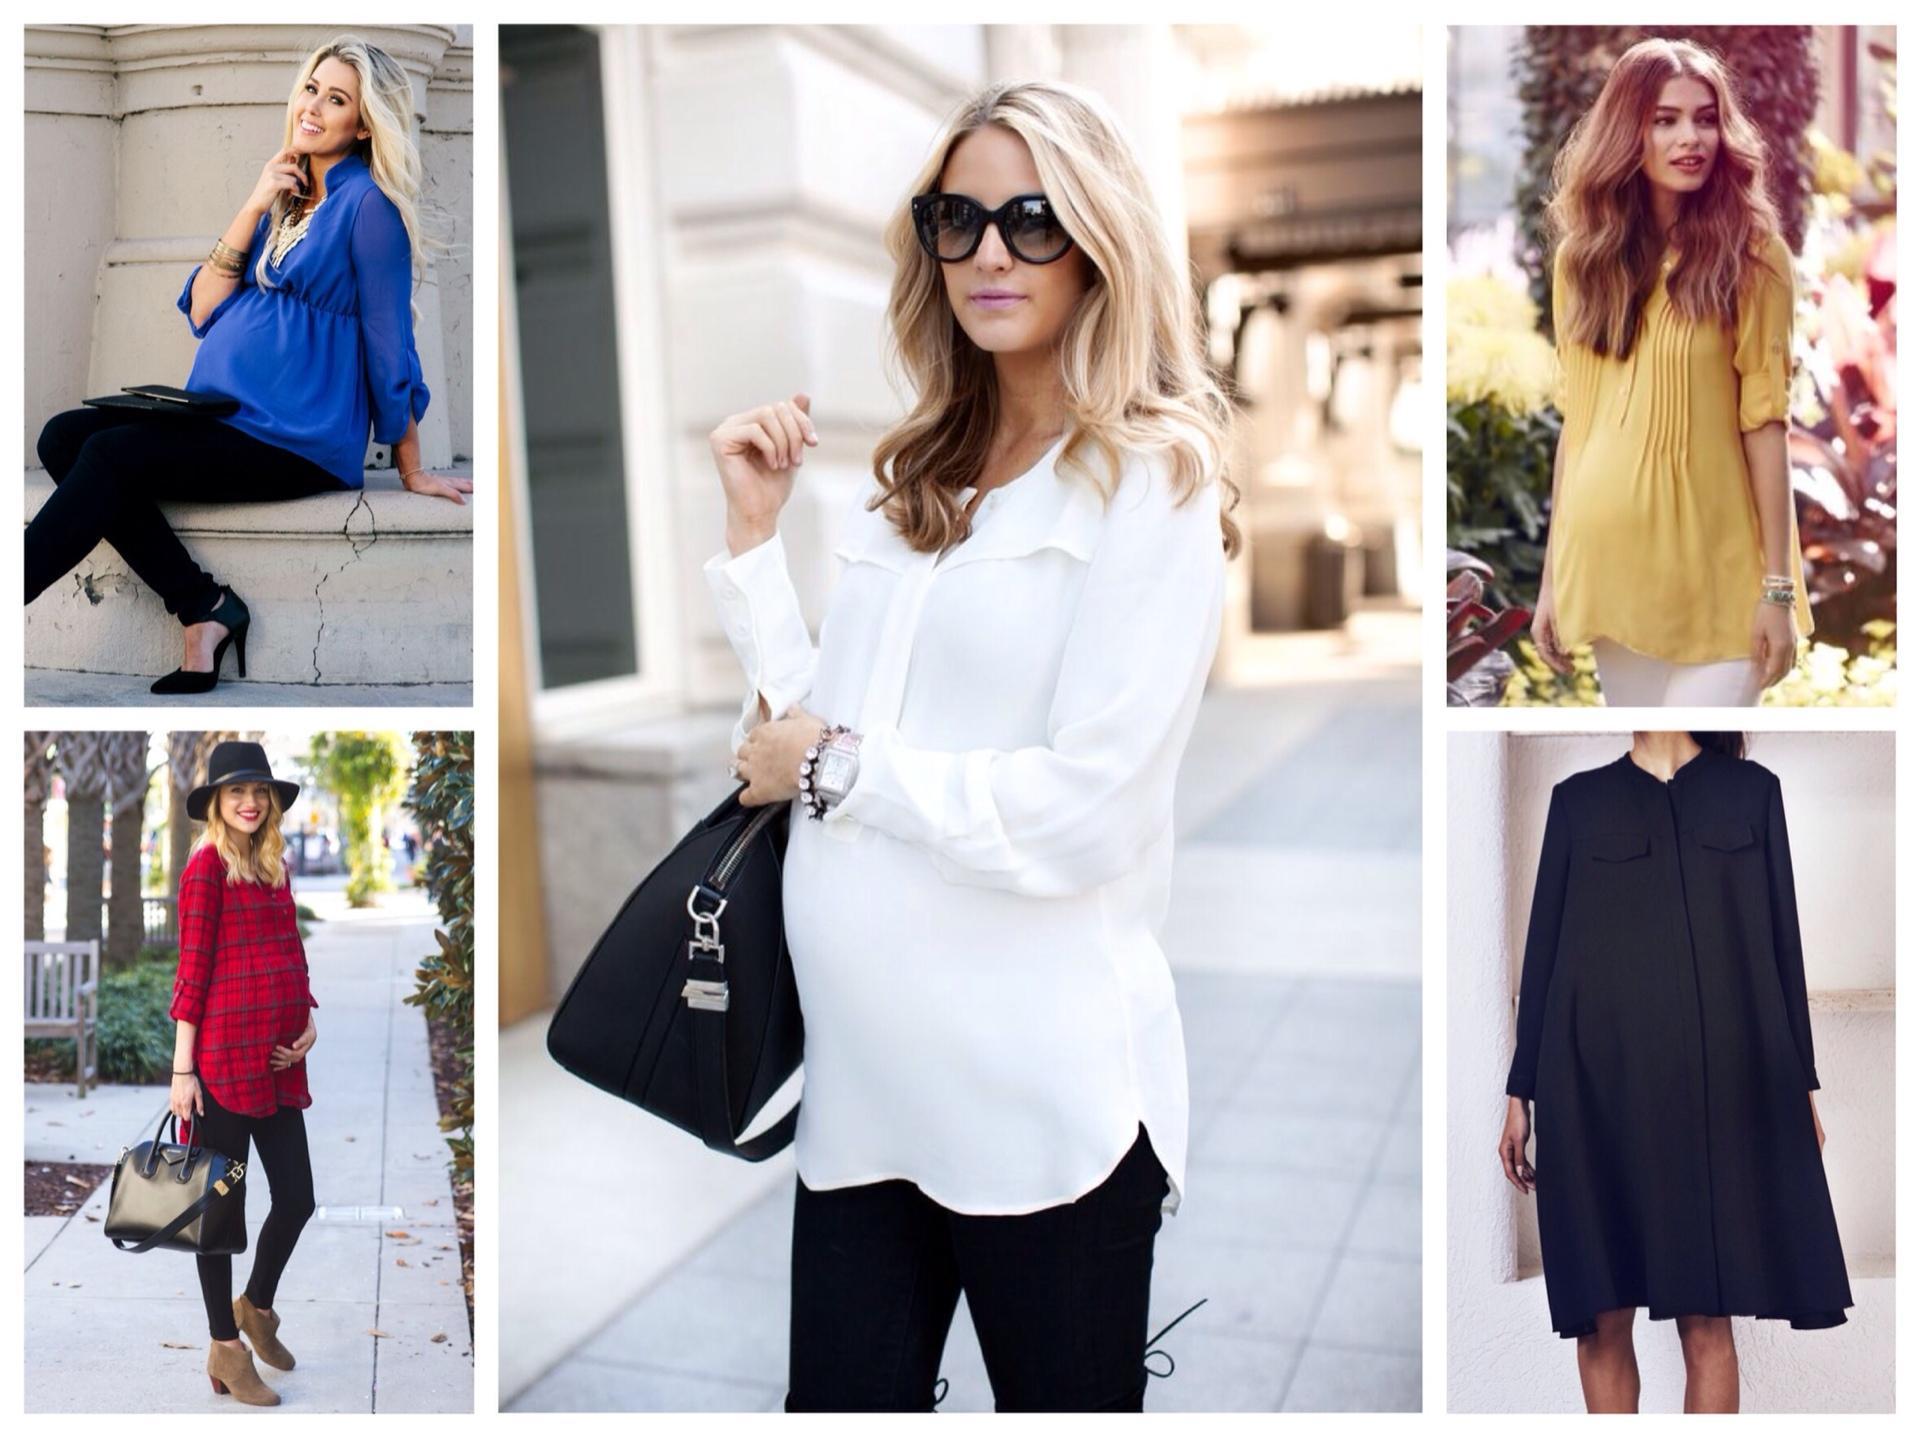 e3fa821a295 блузки и рубашки для беременных. Самая практичная одежда — туника.